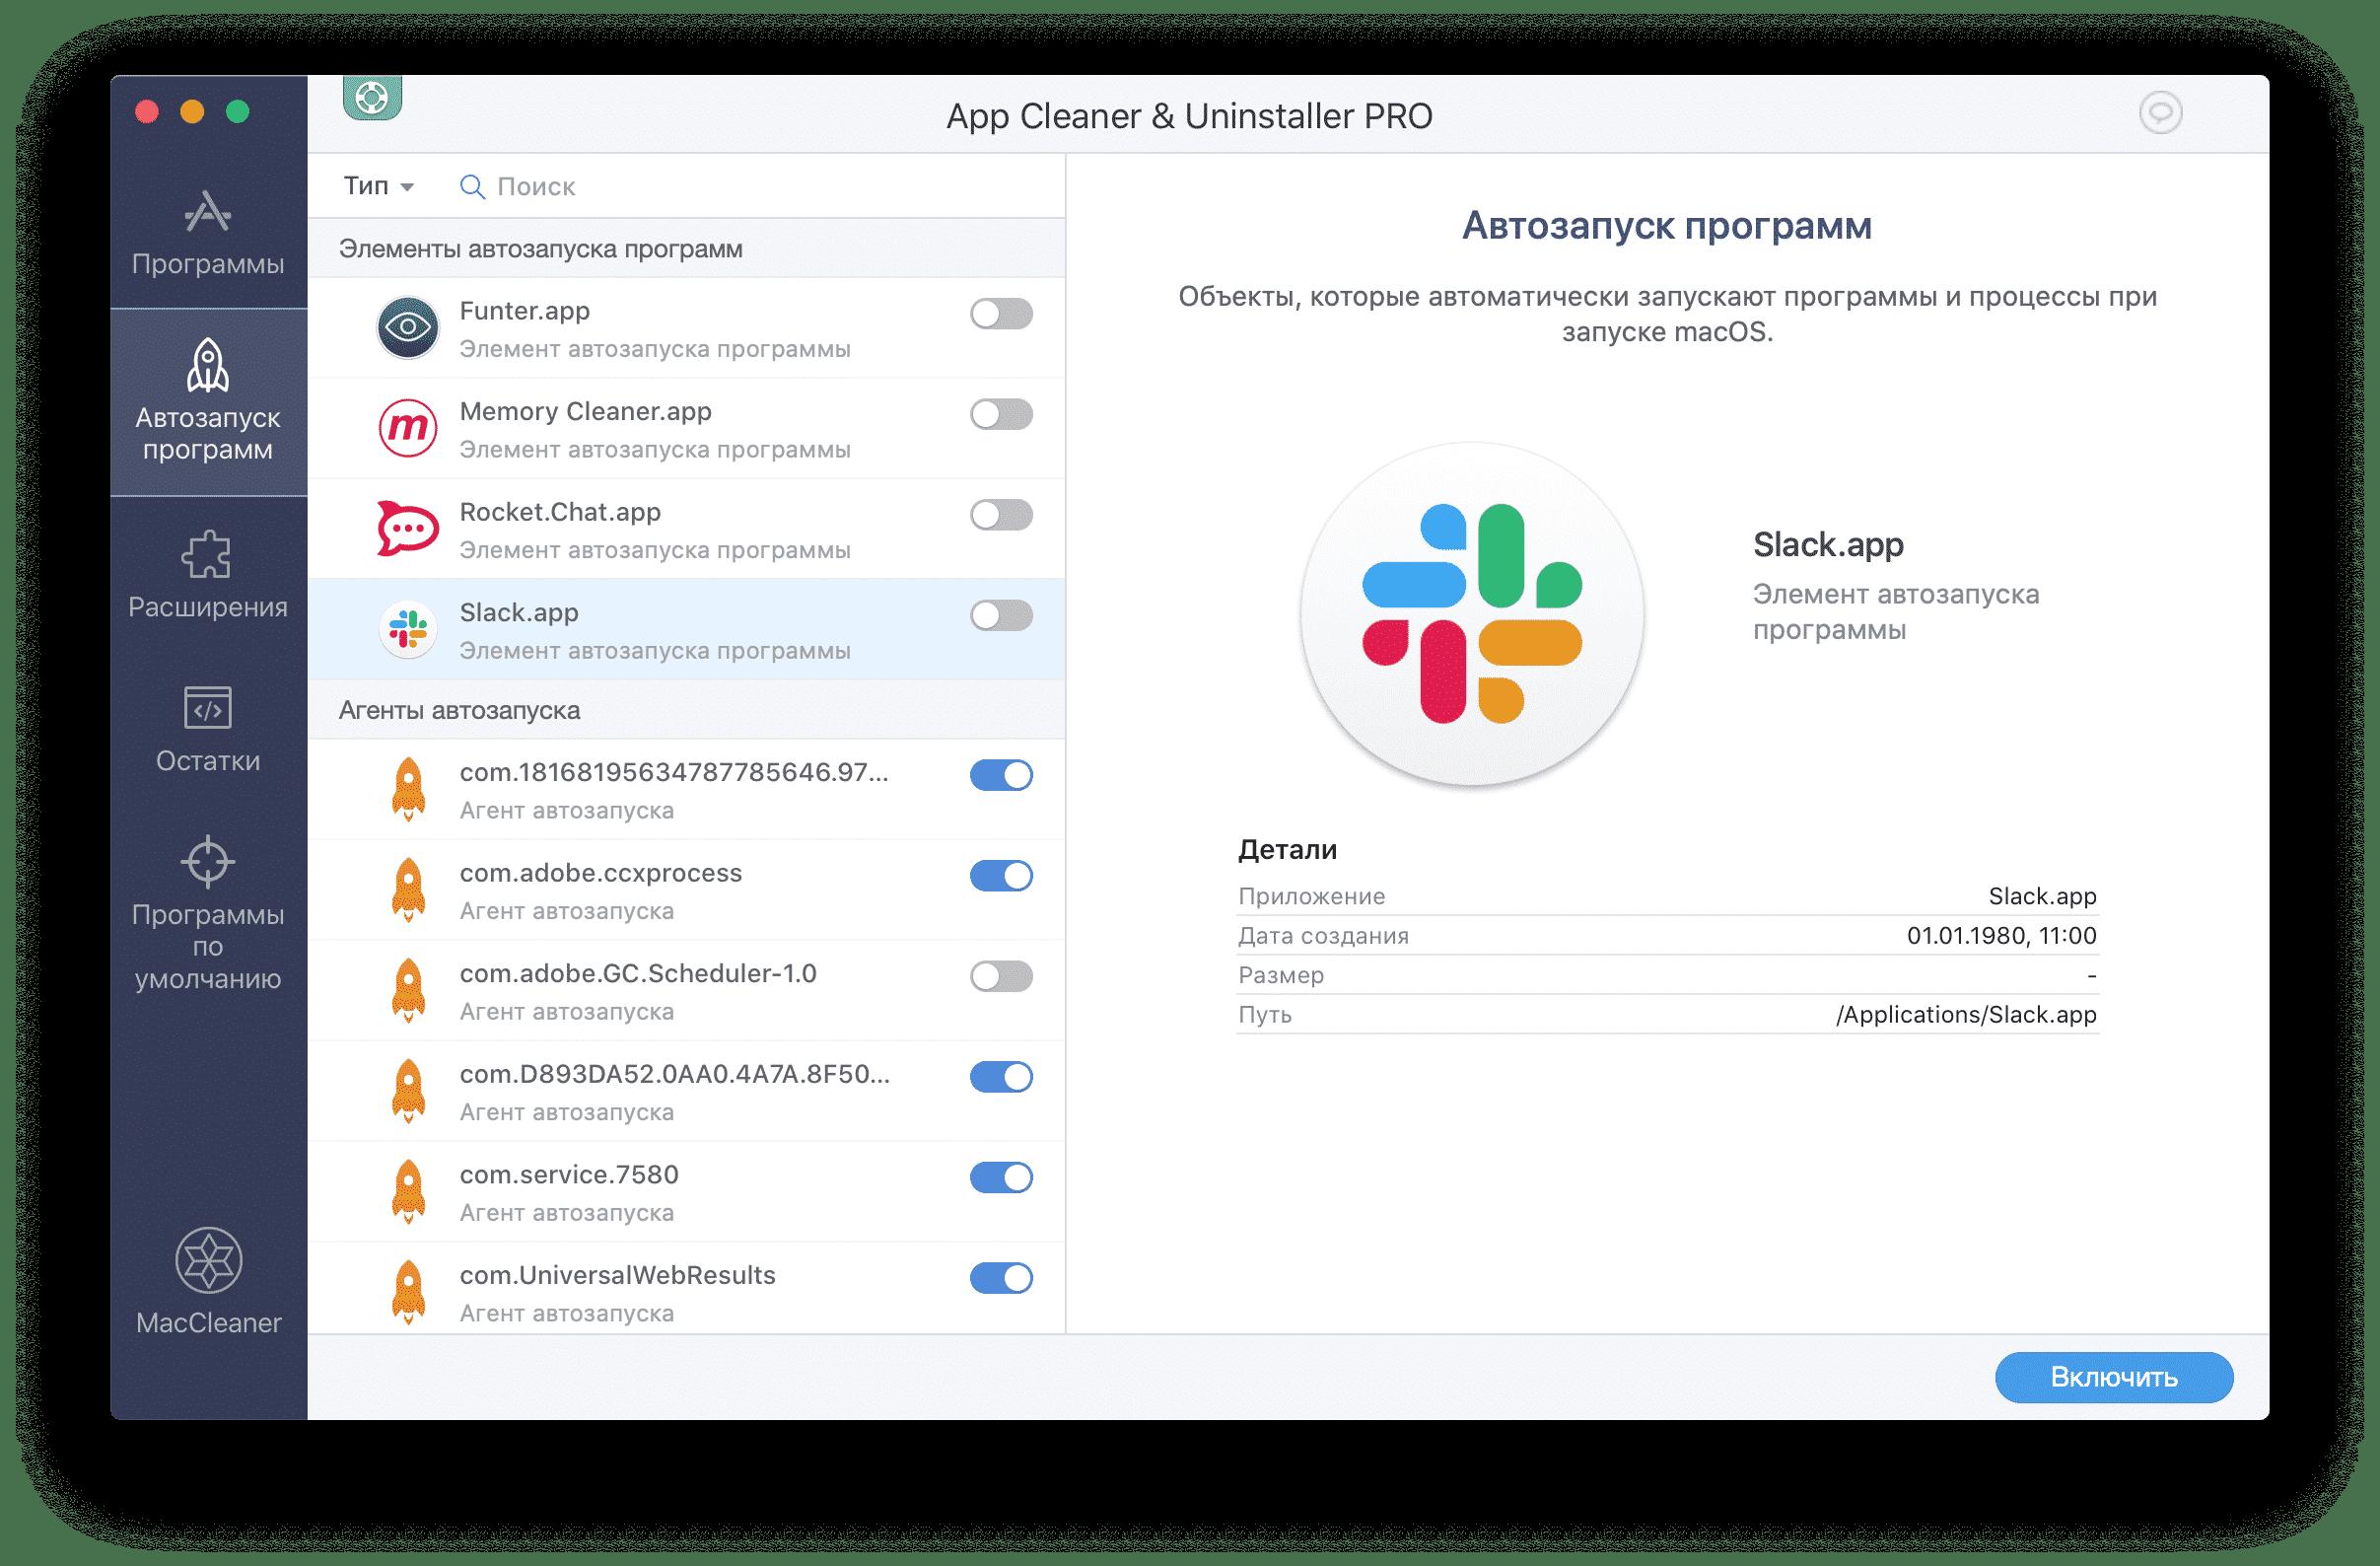 app cleaner startup programms